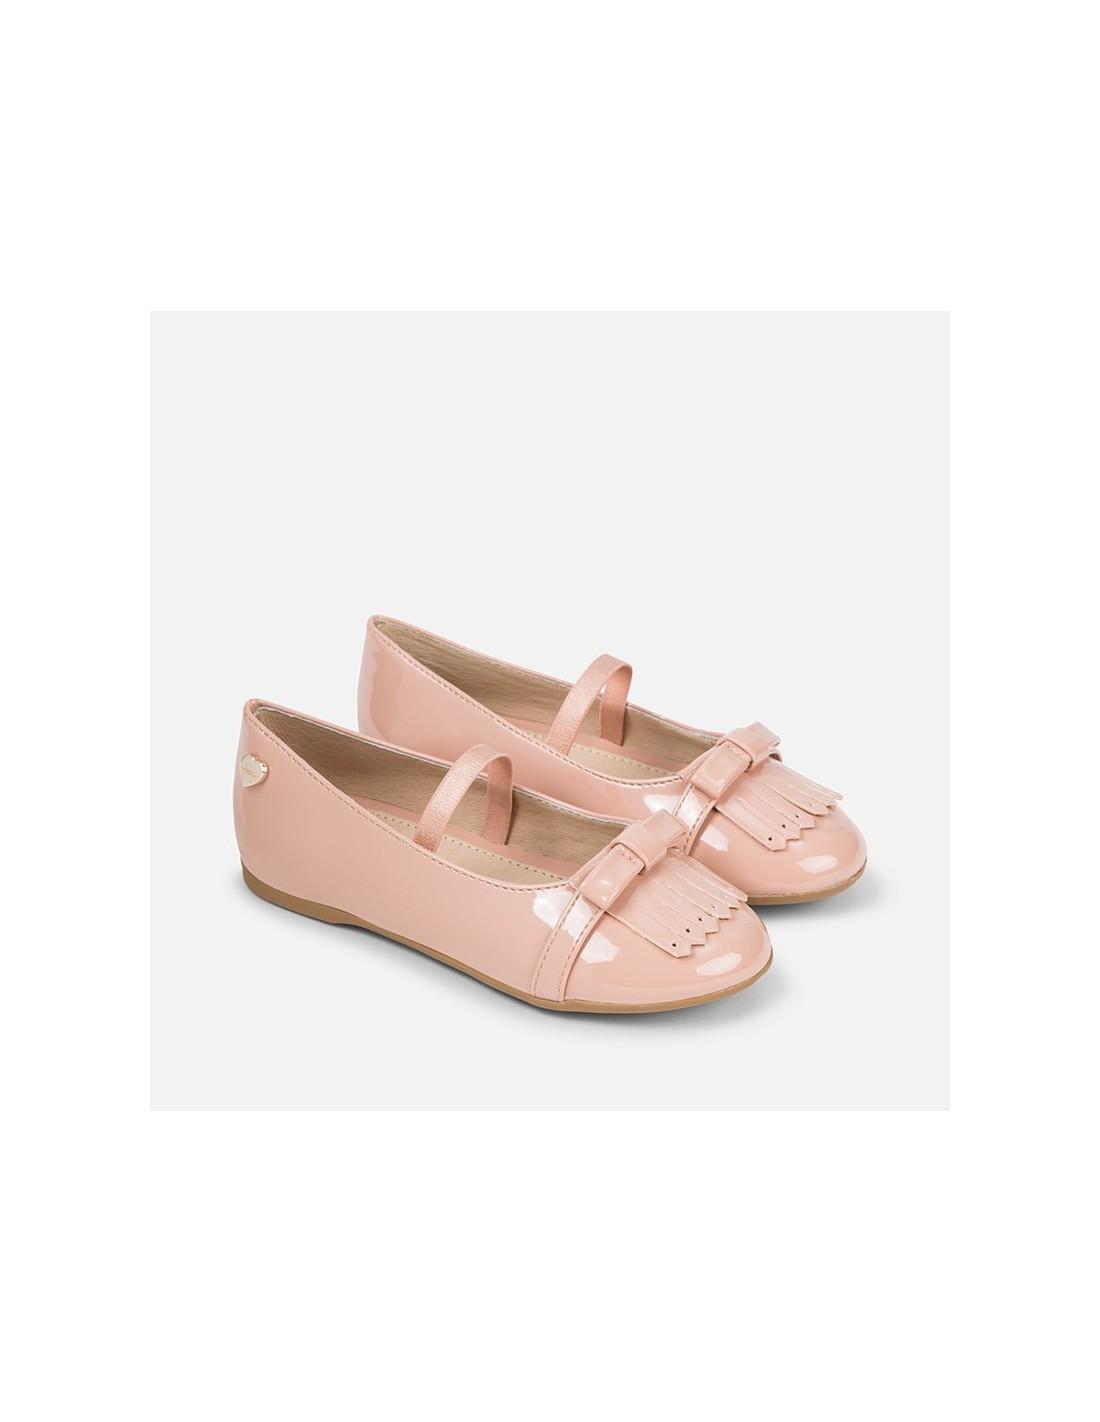 sneakers for cheap d4e3c b968f Mayoral scarpe bambina ballerina con frange vernice cipria 44711 46711  48711 - Angela Barba